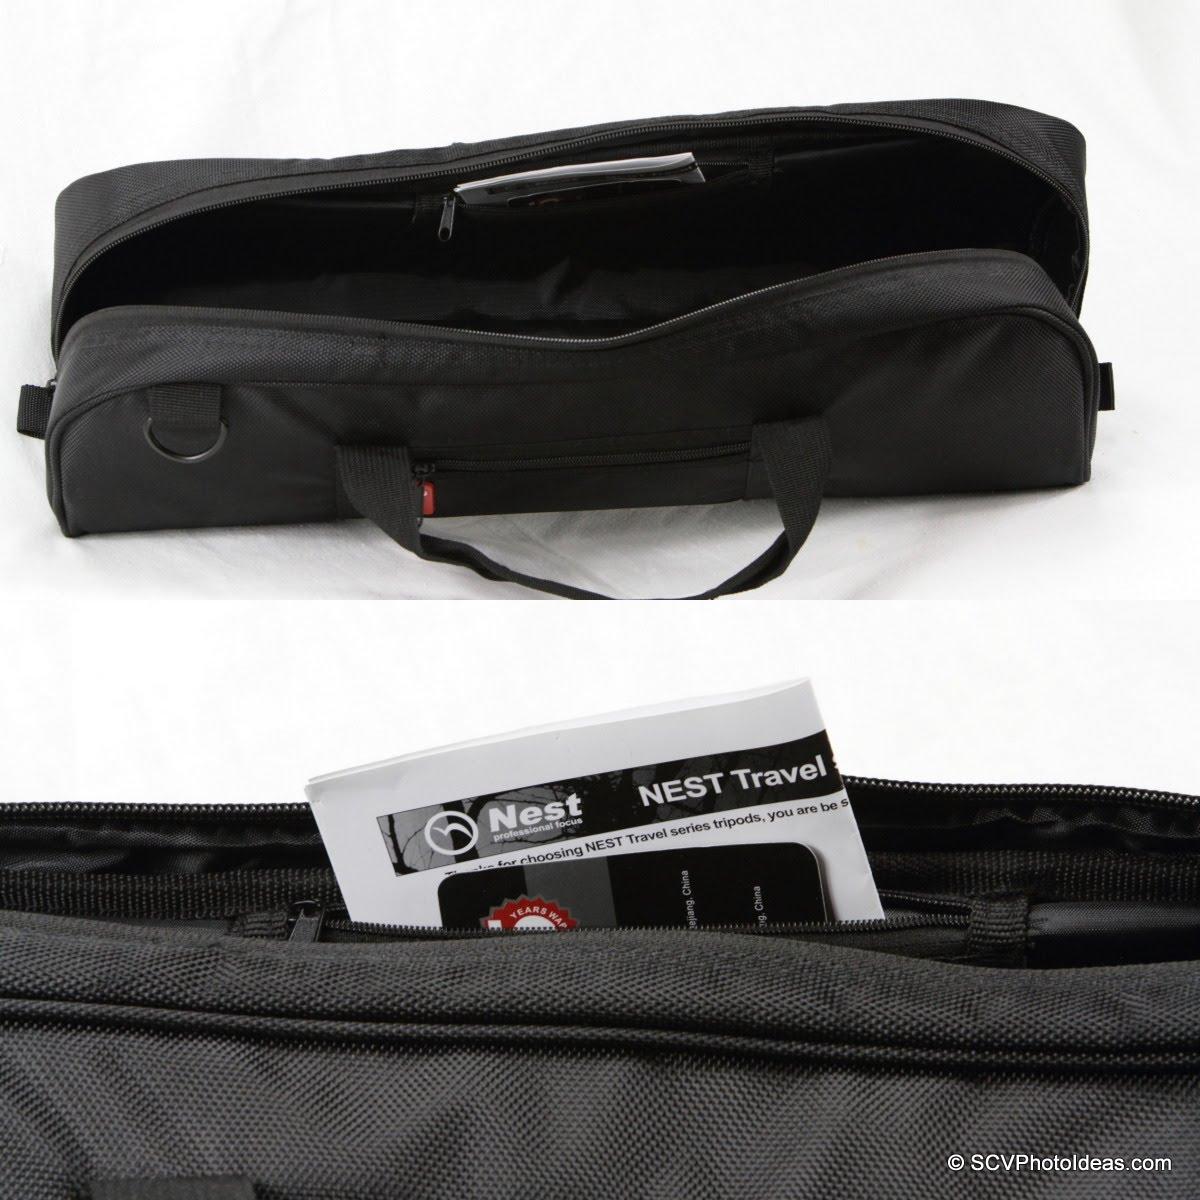 Nest NT-6294CT carrying case internal pocket detail